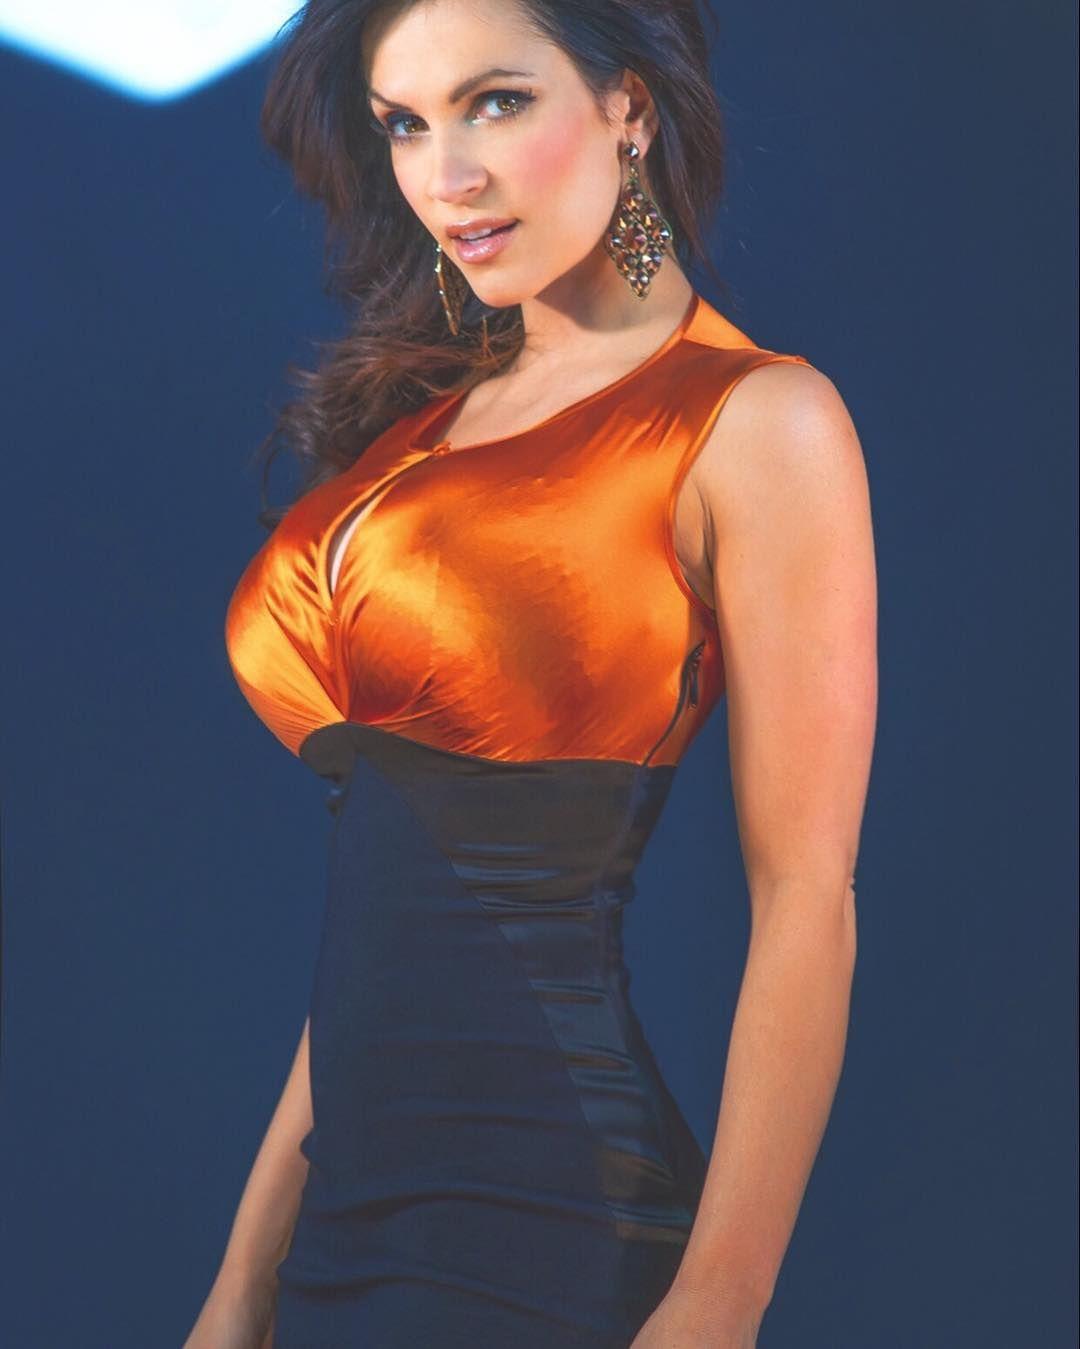 #tbt #marciano #dress